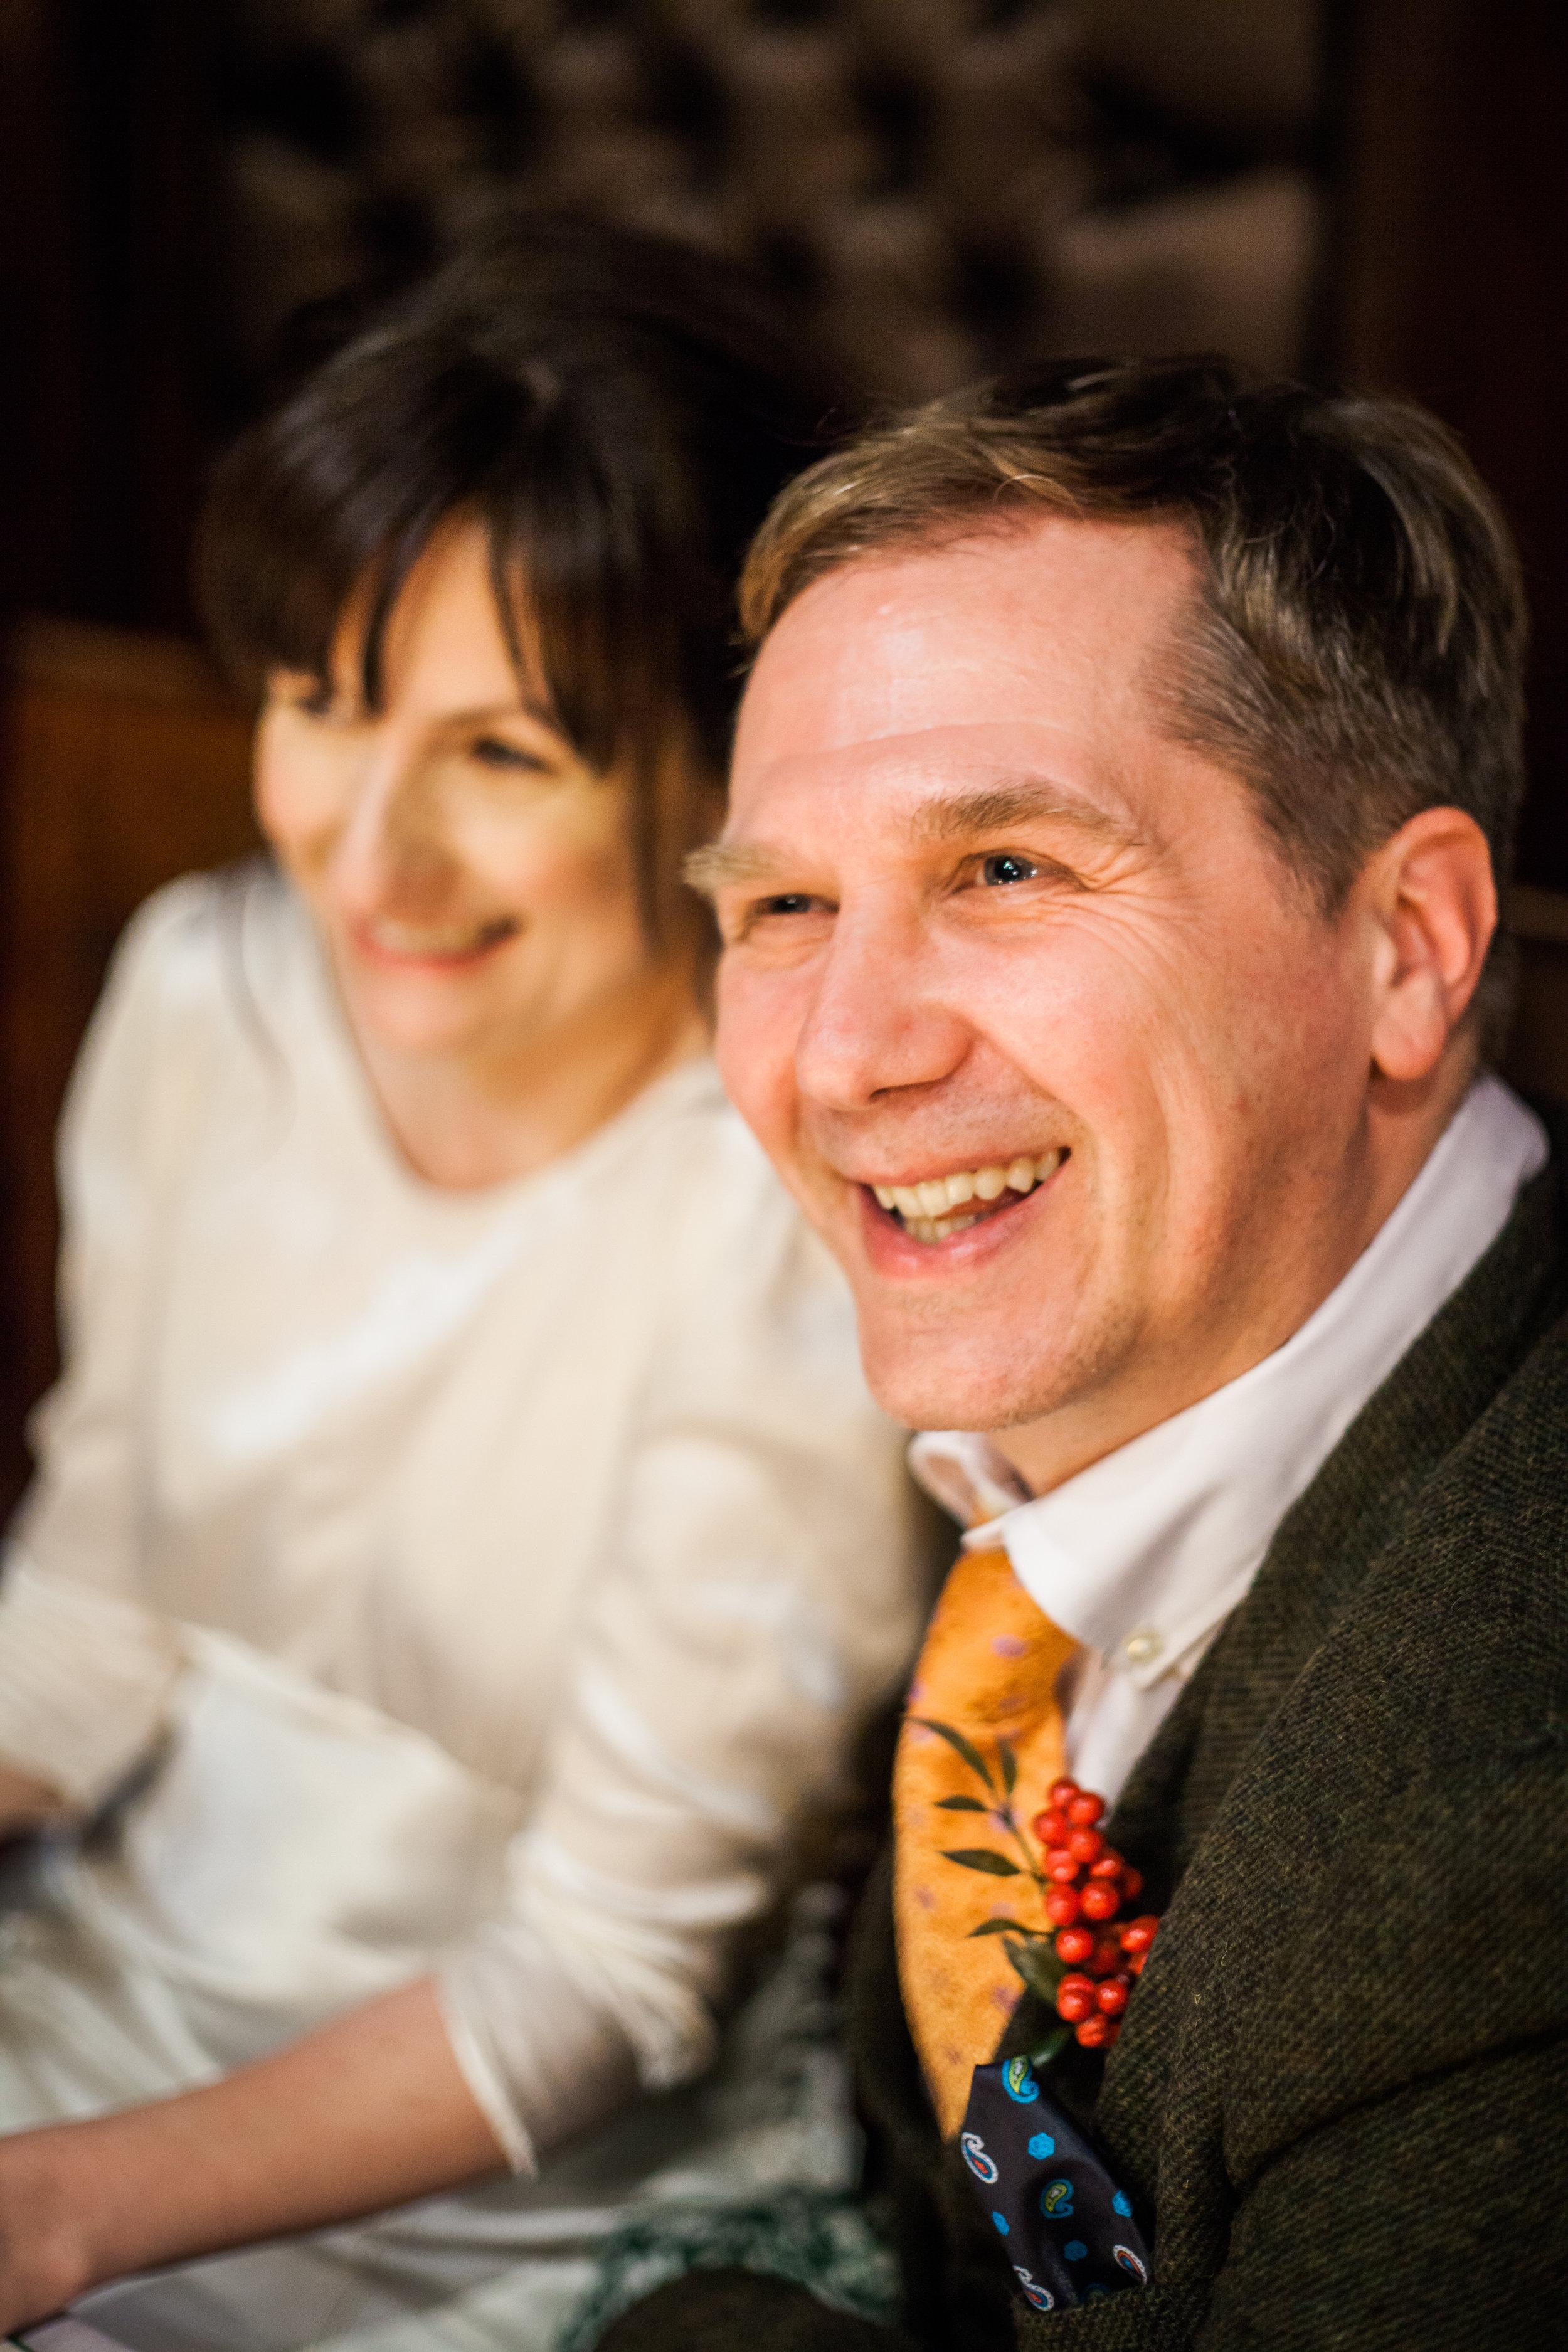 Georgina and Steven - Belle Epoque wedding, Cheshire.